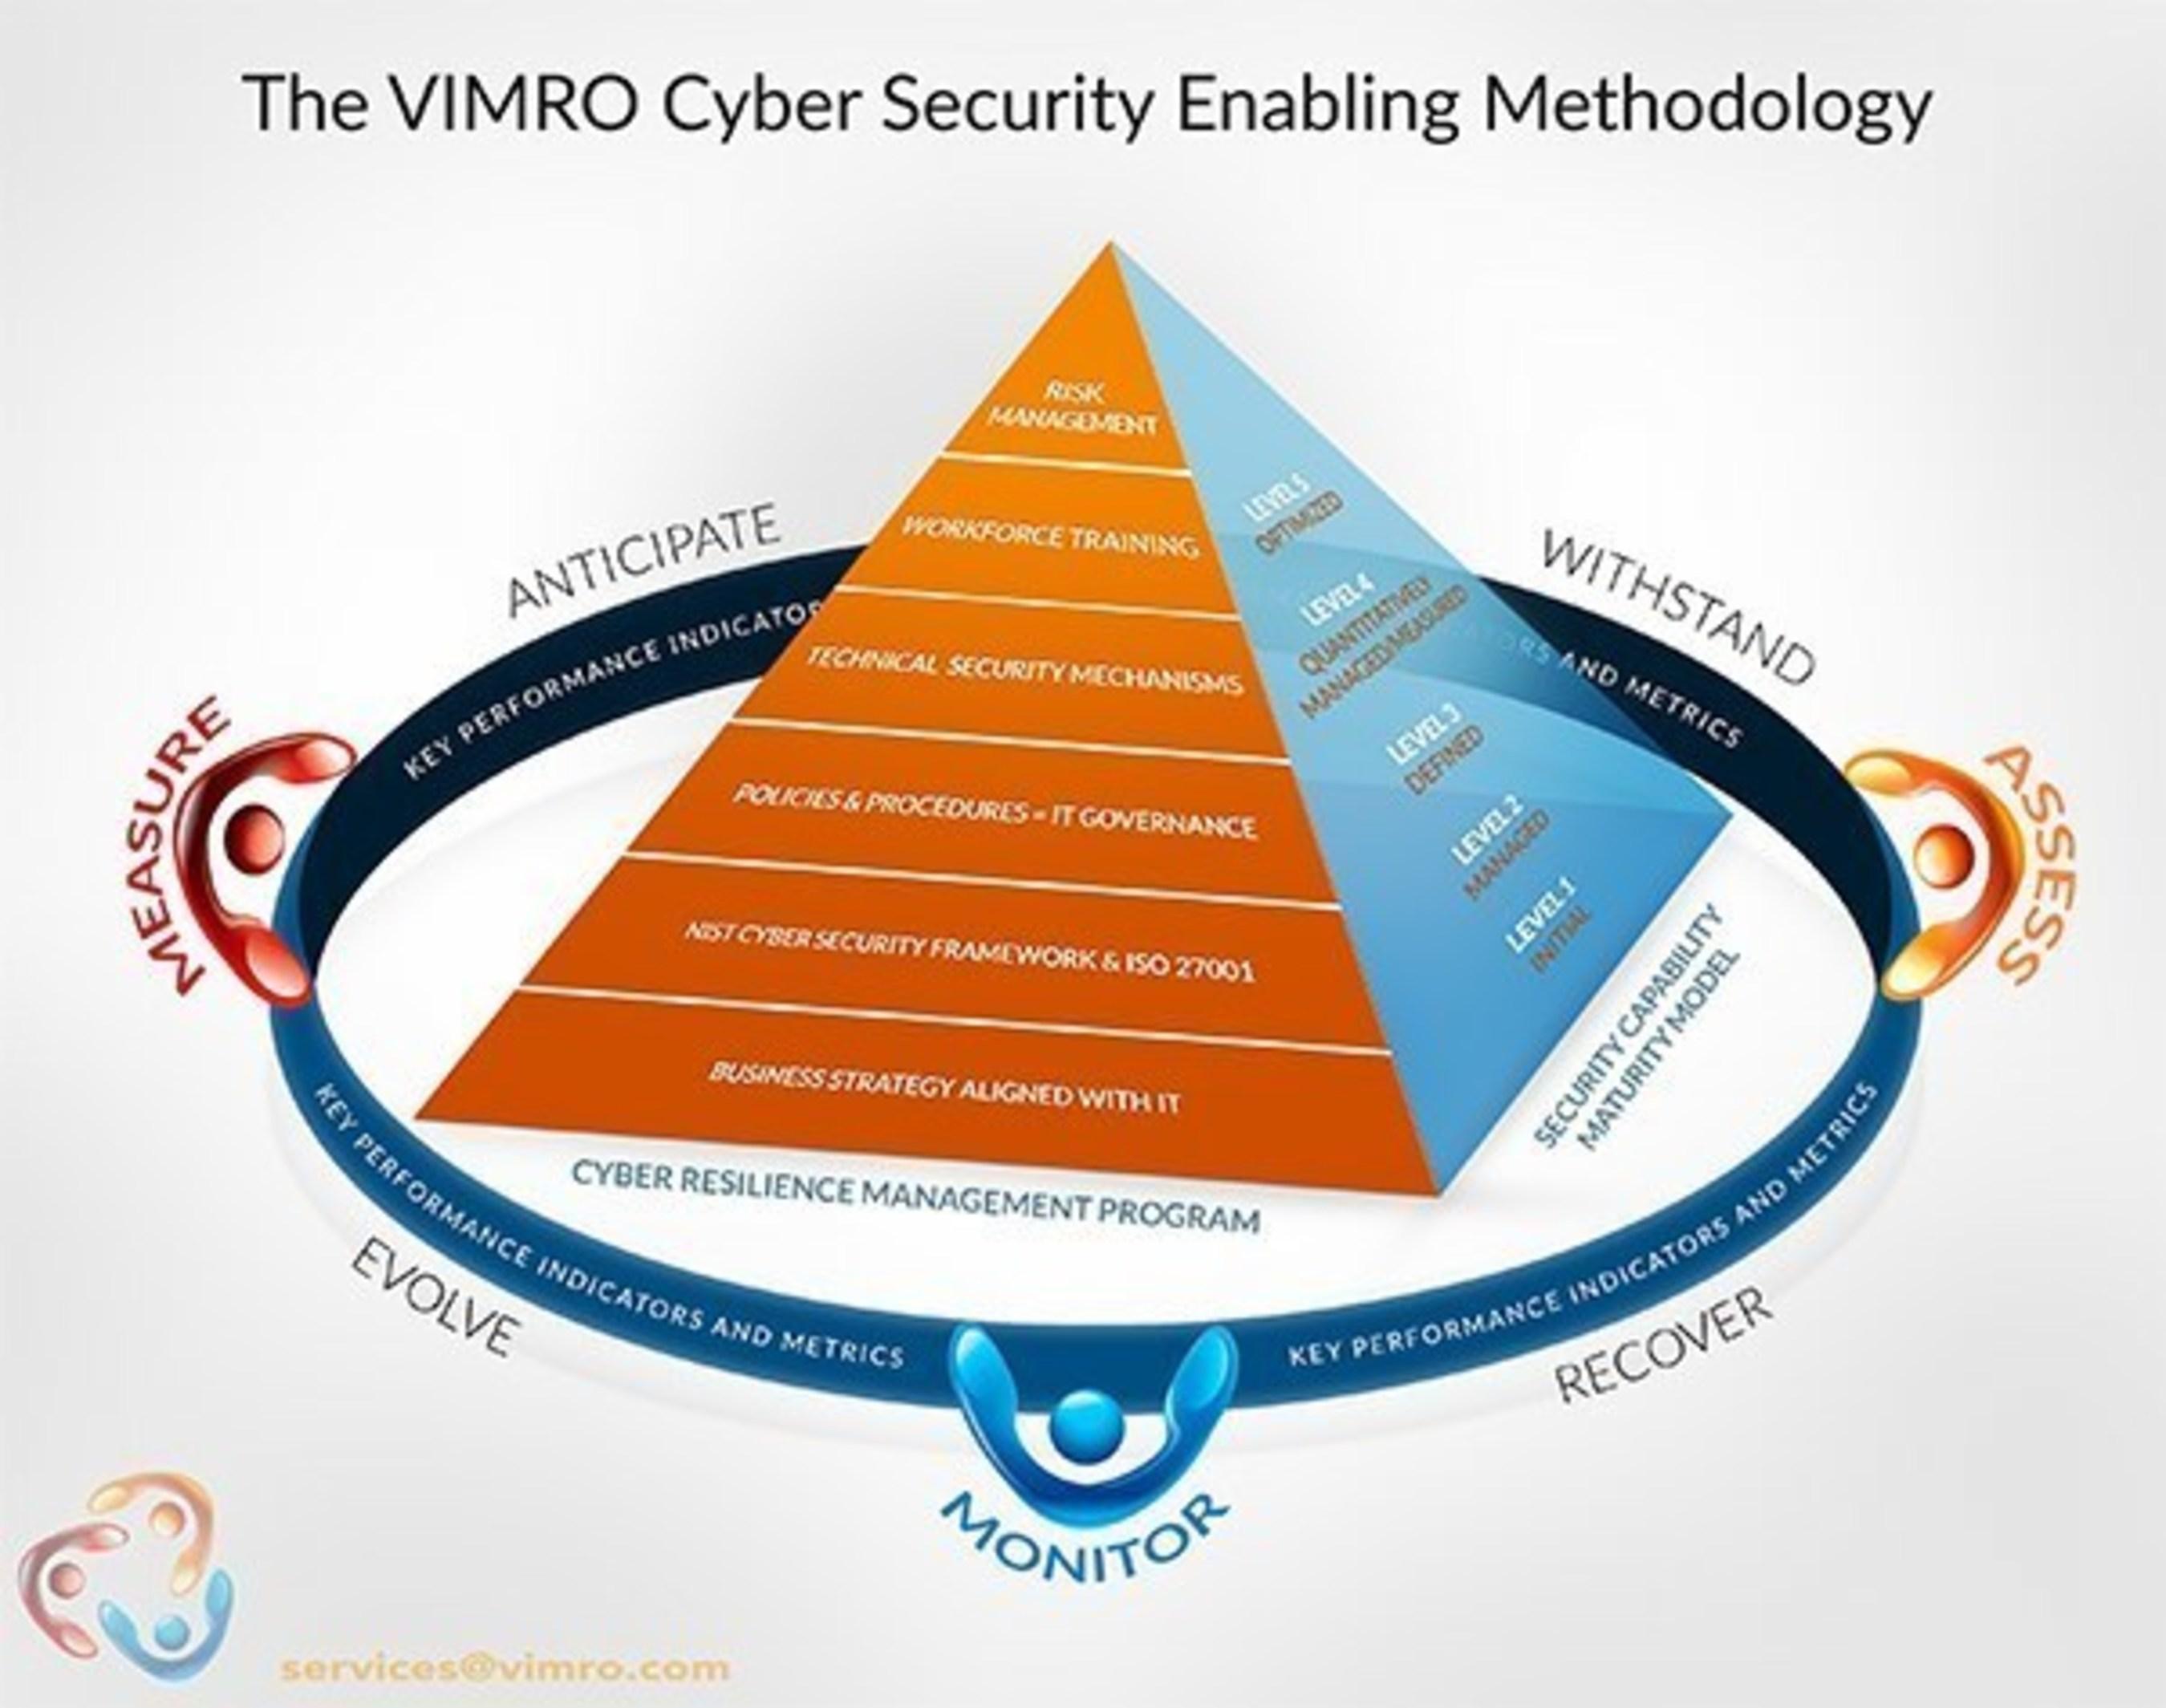 VIMRO Unveils the Cyber Security Enabling Methodology